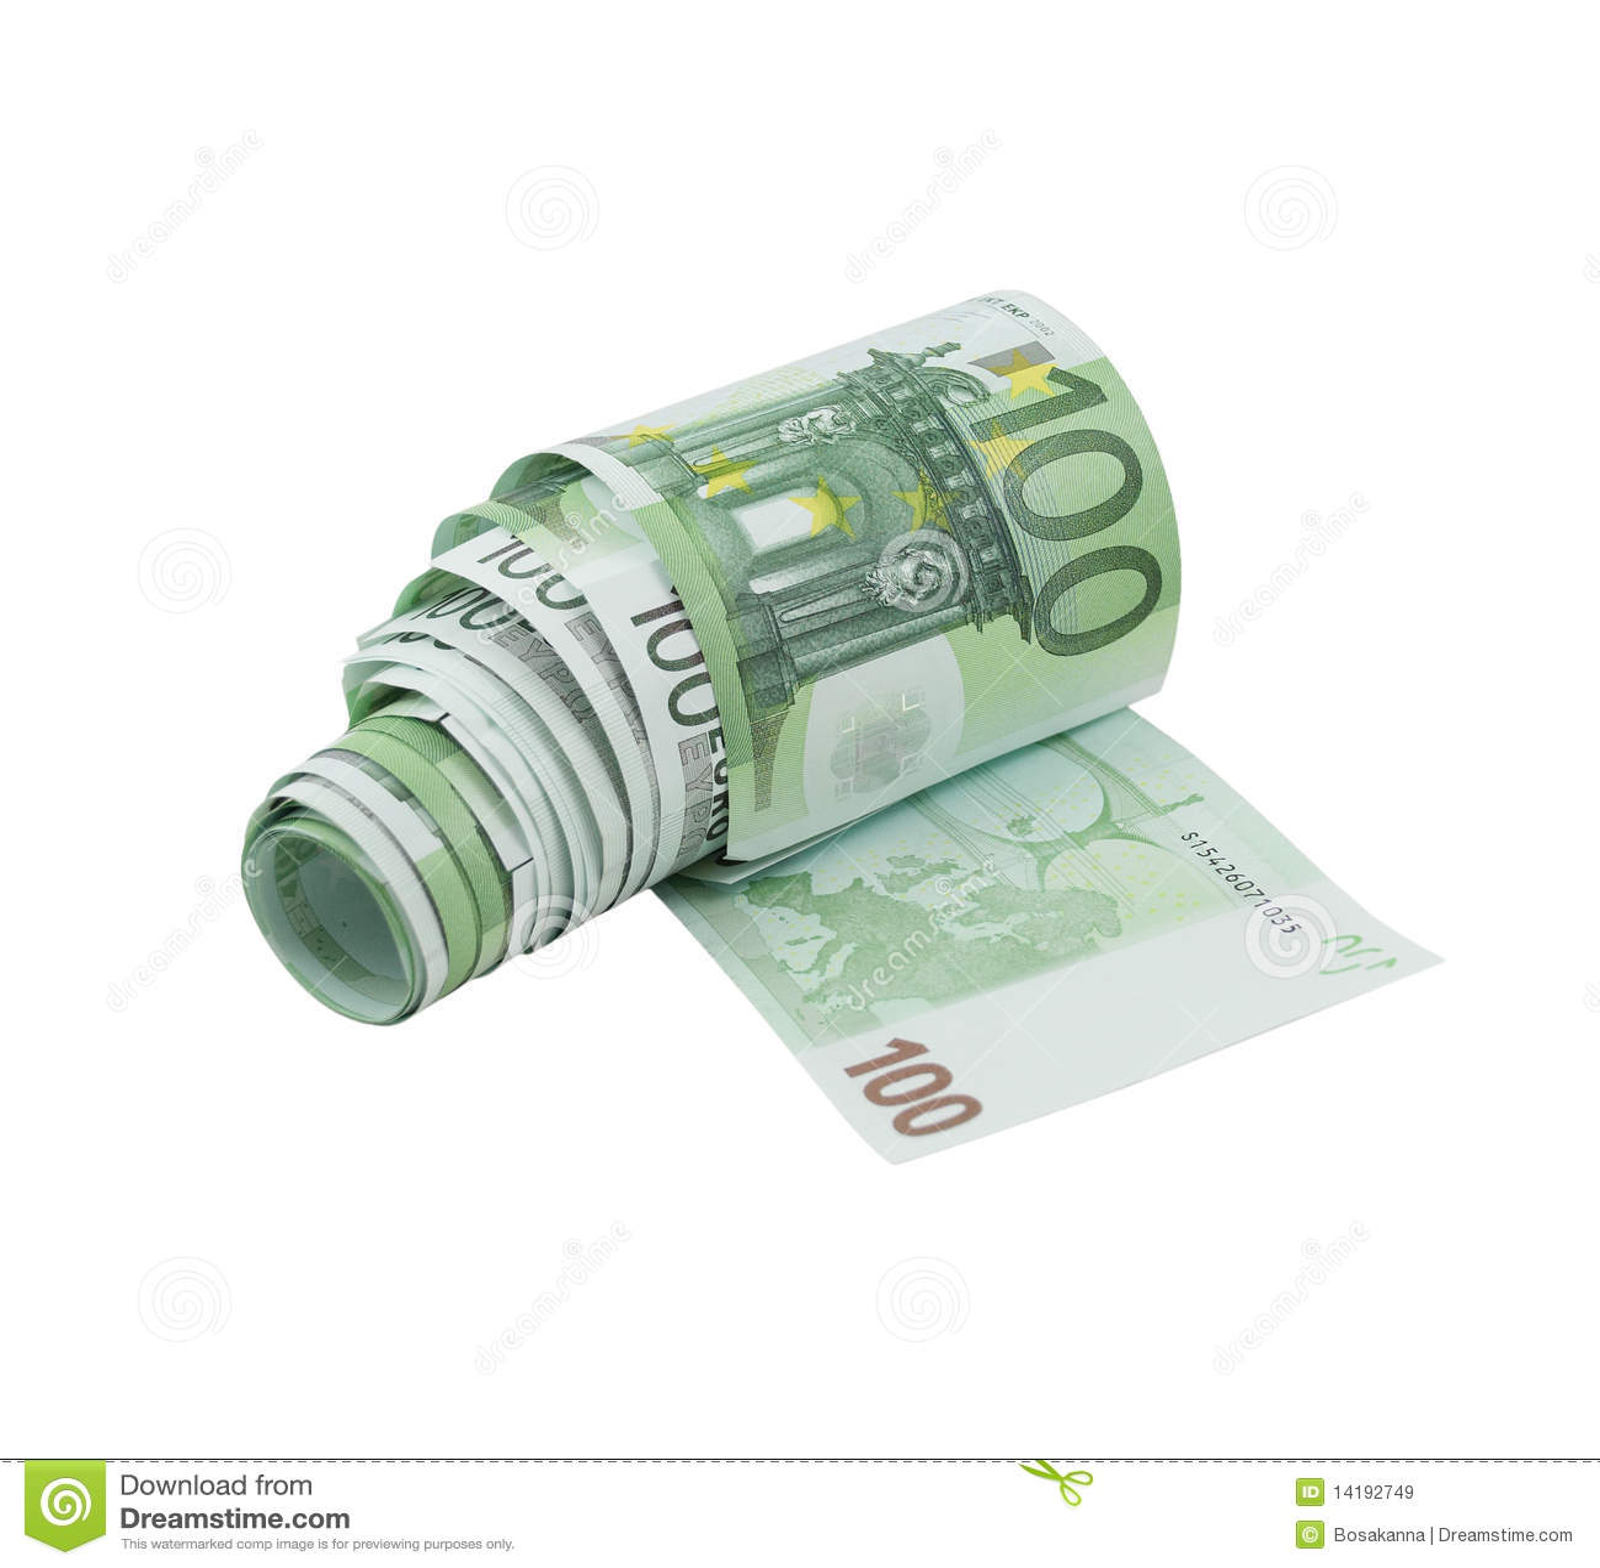 Download Dj Dollar Bill: 100-Euro Bill Money Toilet Paper Stock Image